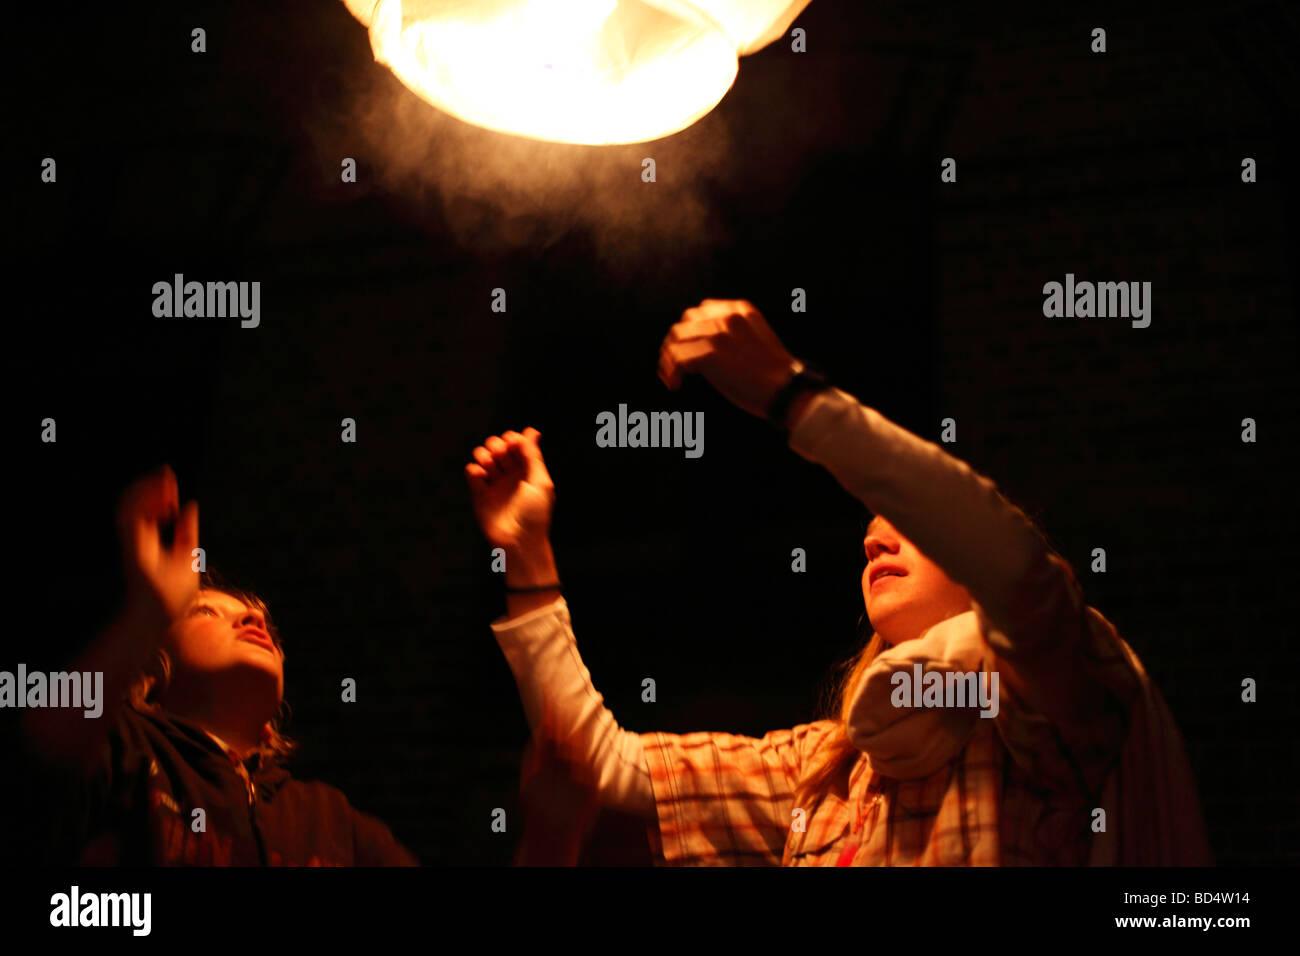 teens launch sky lantern; hot air balloon; floating lantern - Stock Image